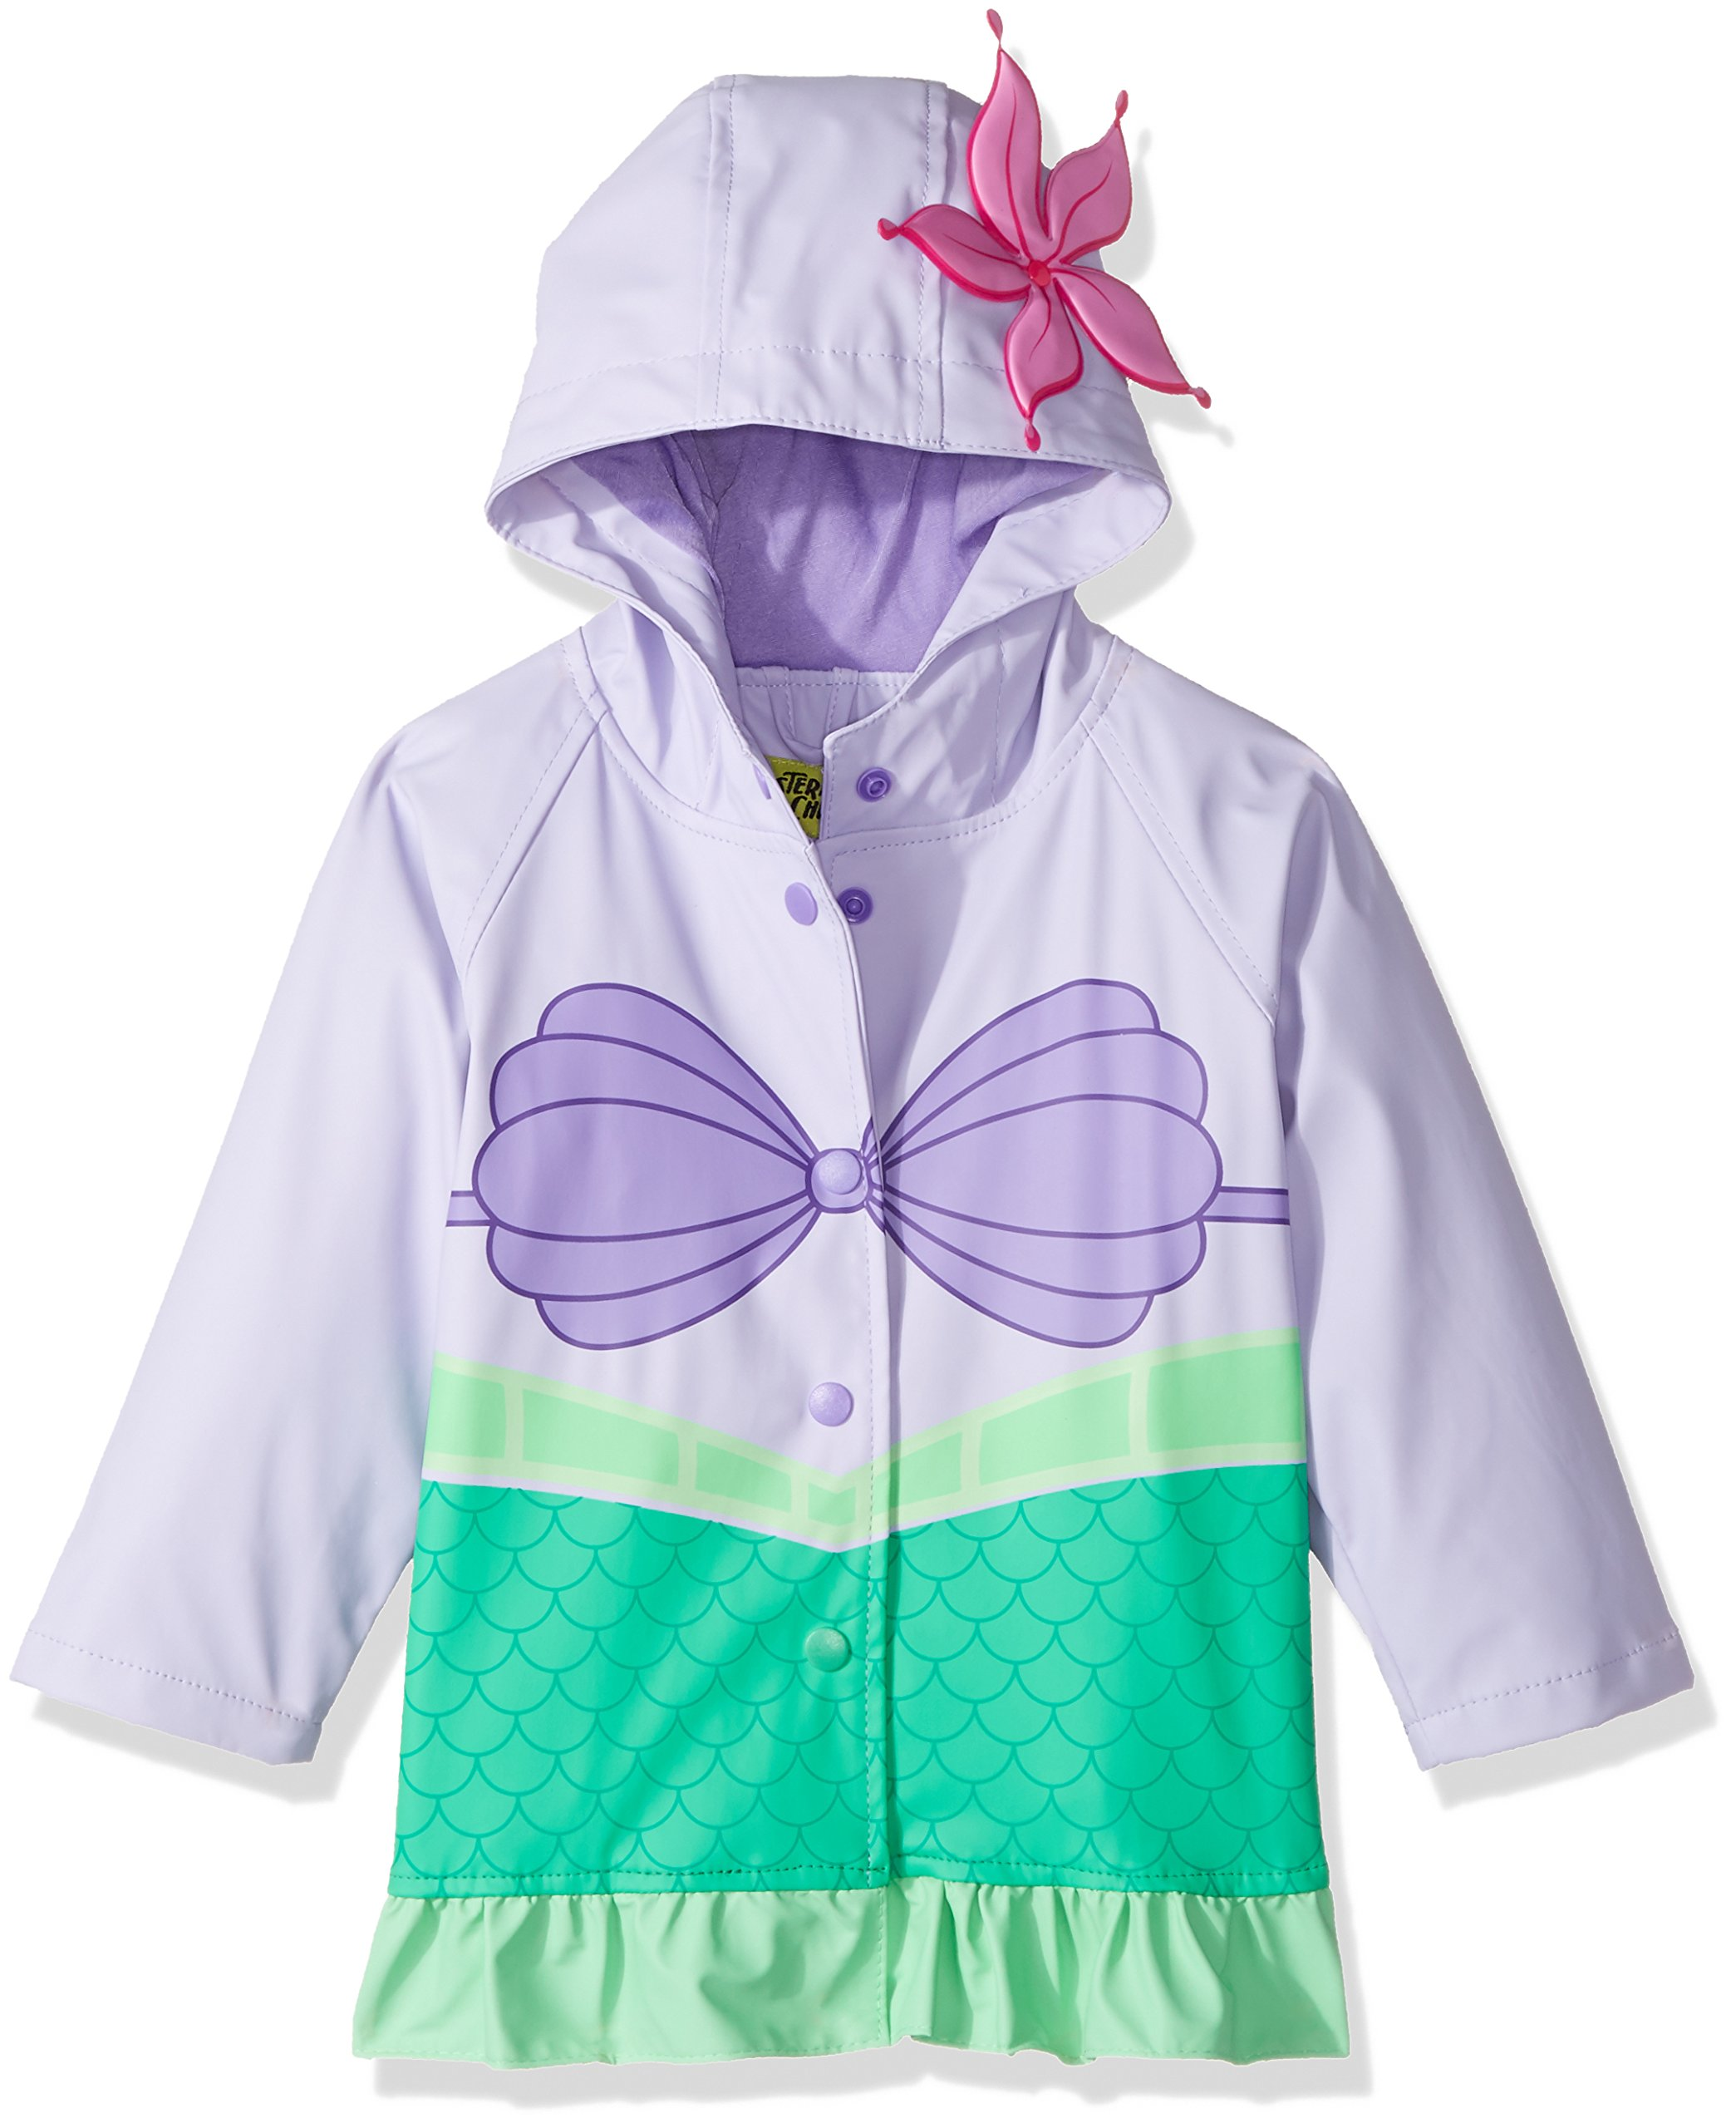 Western Chief Kids Disney Character lined Rain Jacket, Ariel Disney Princess, 2T by Western Chief Apparel